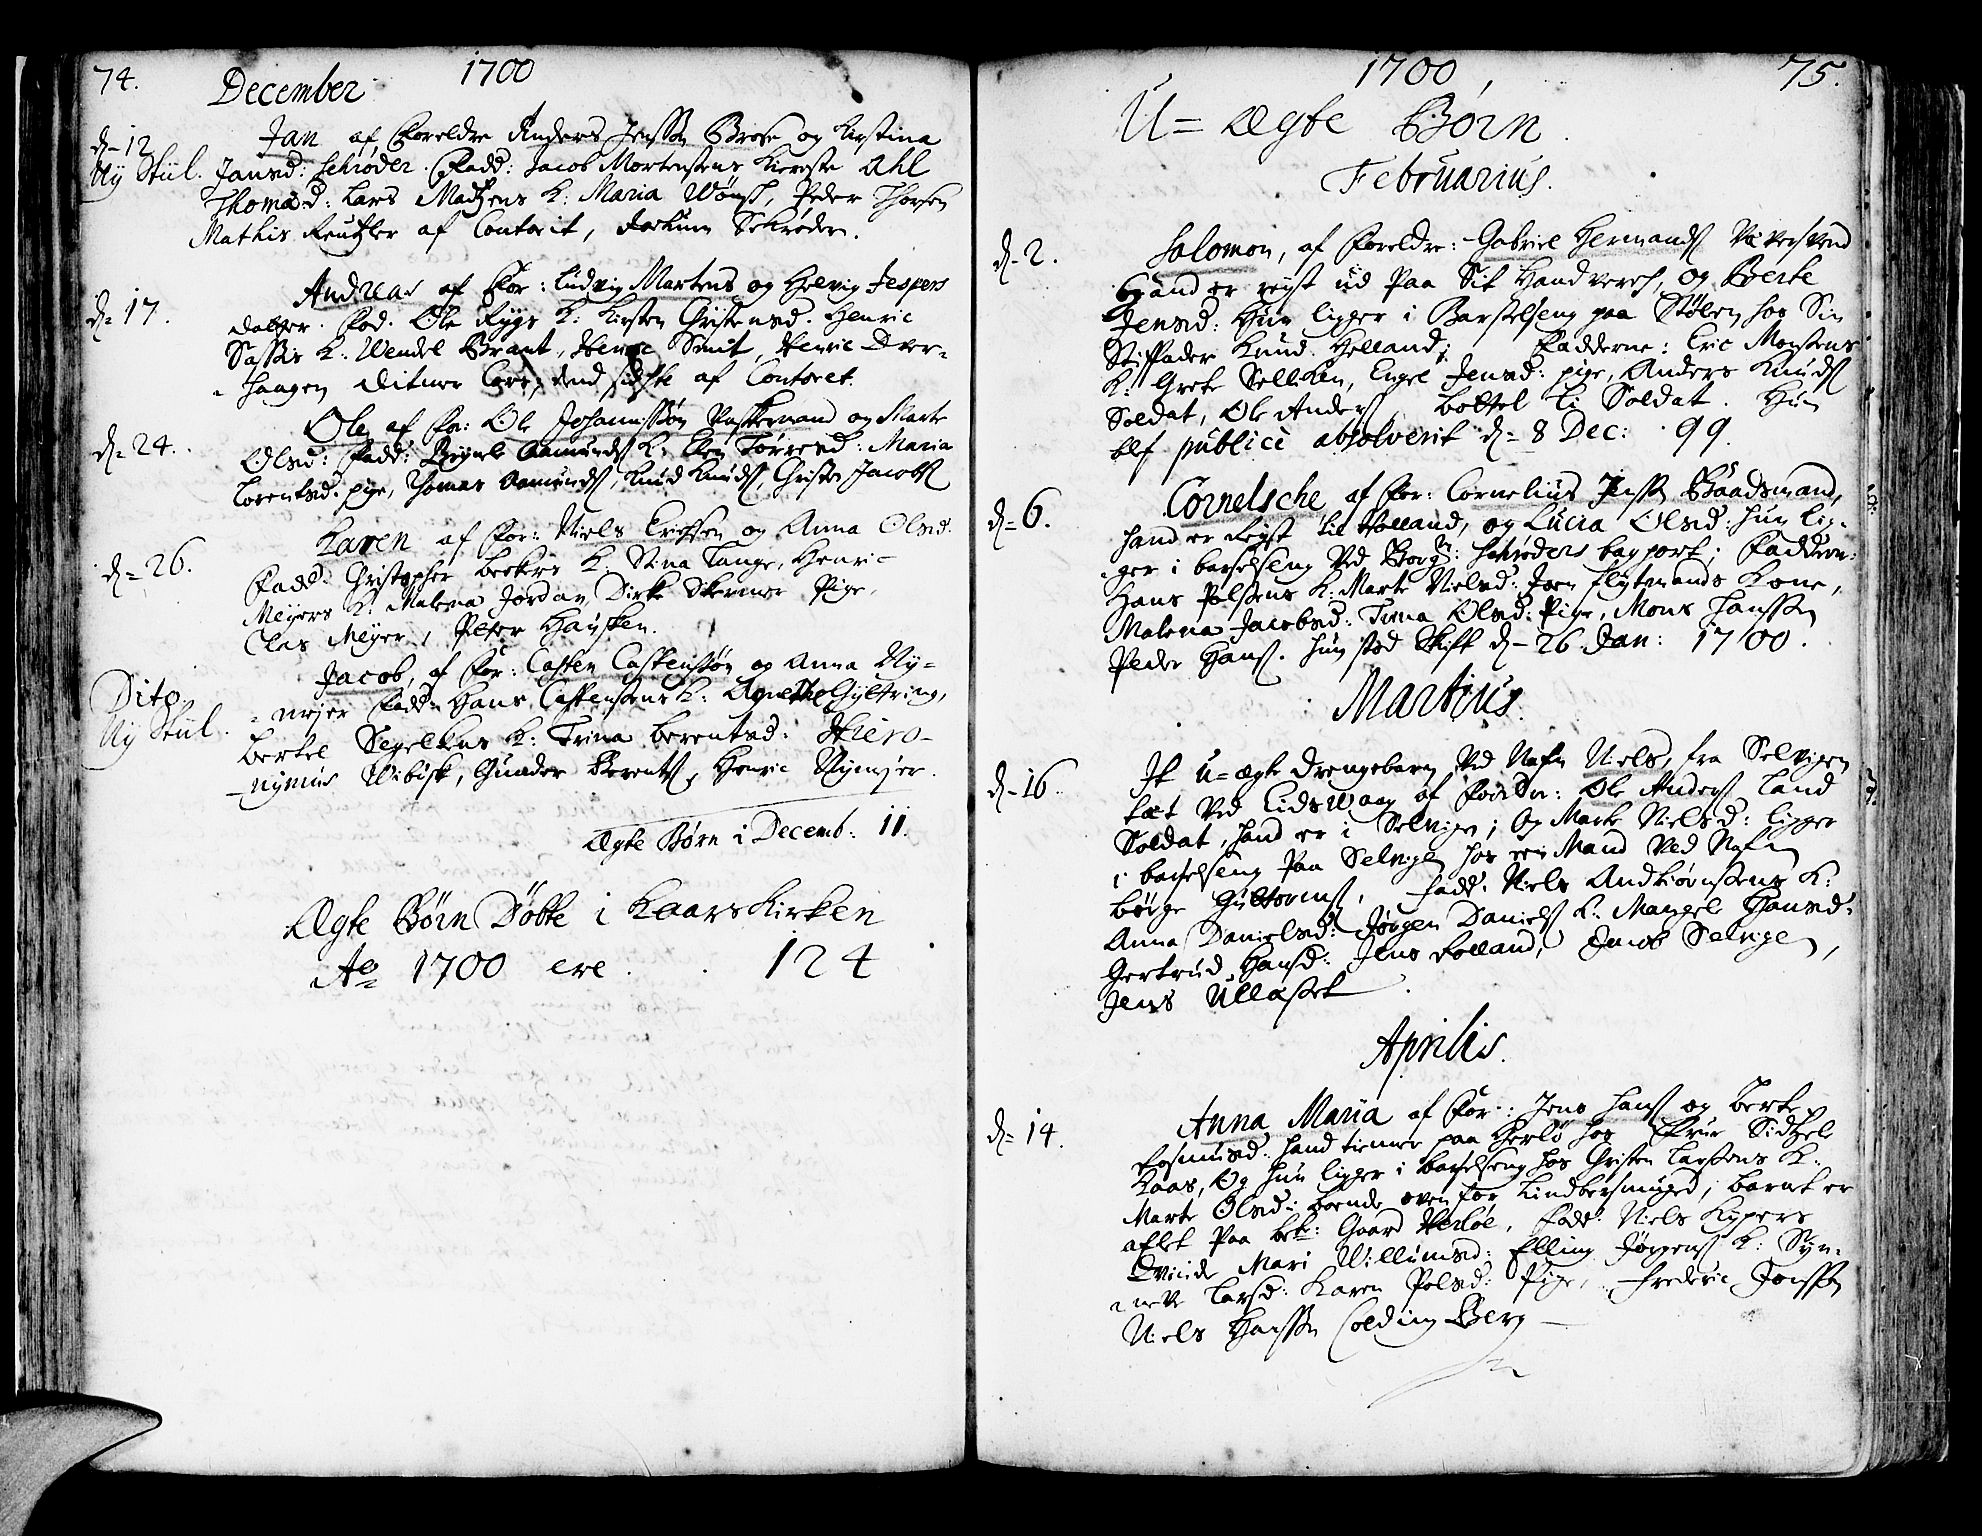 SAB, Korskirken Sokneprestembete, H/Haa/L0003: Ministerialbok nr. A 3, 1698-1719, s. 74-75